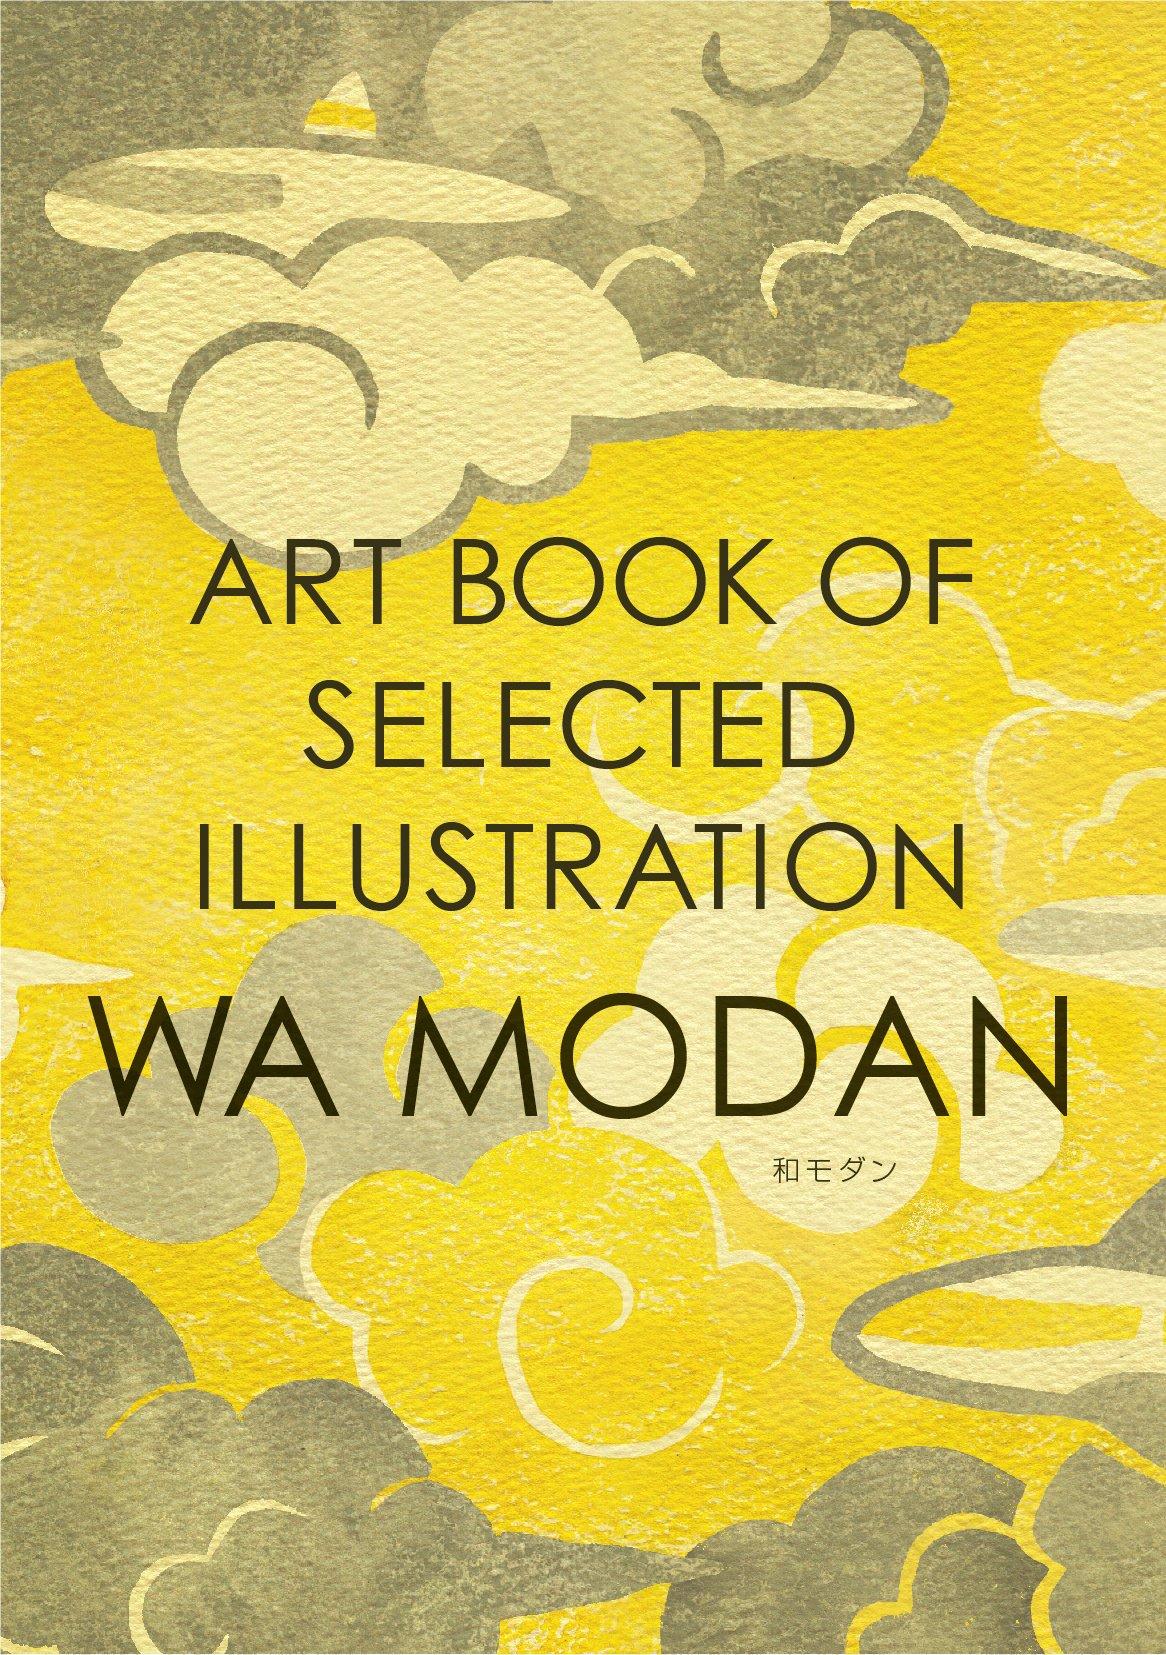 art book of selected illustration 和モダン 本 通販 amazon